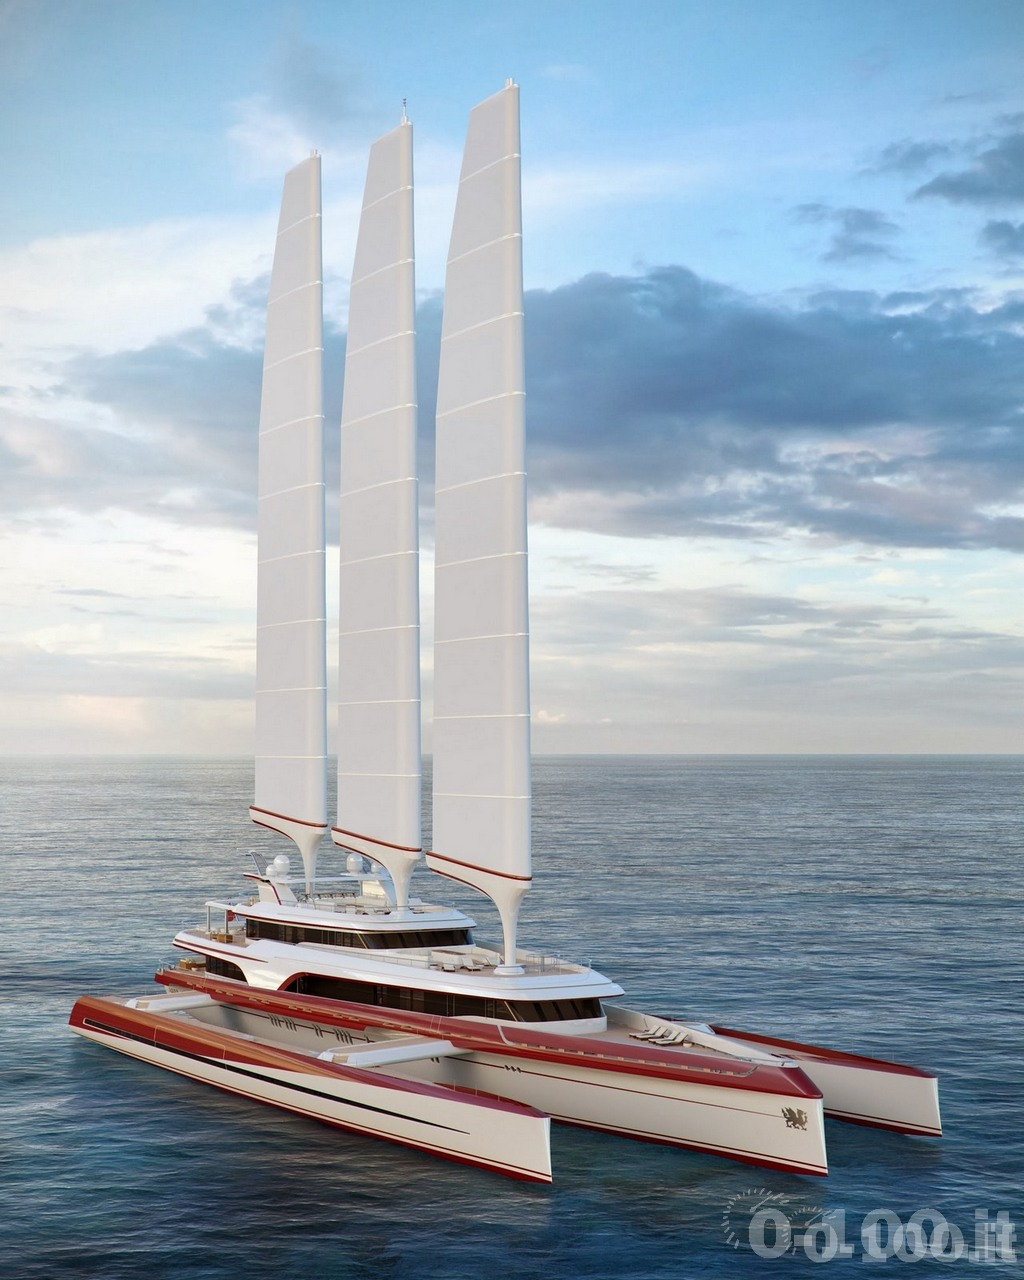 dragonship-80-trimaran-pi-yachts-mcpherson-yacht-design-0-100_6